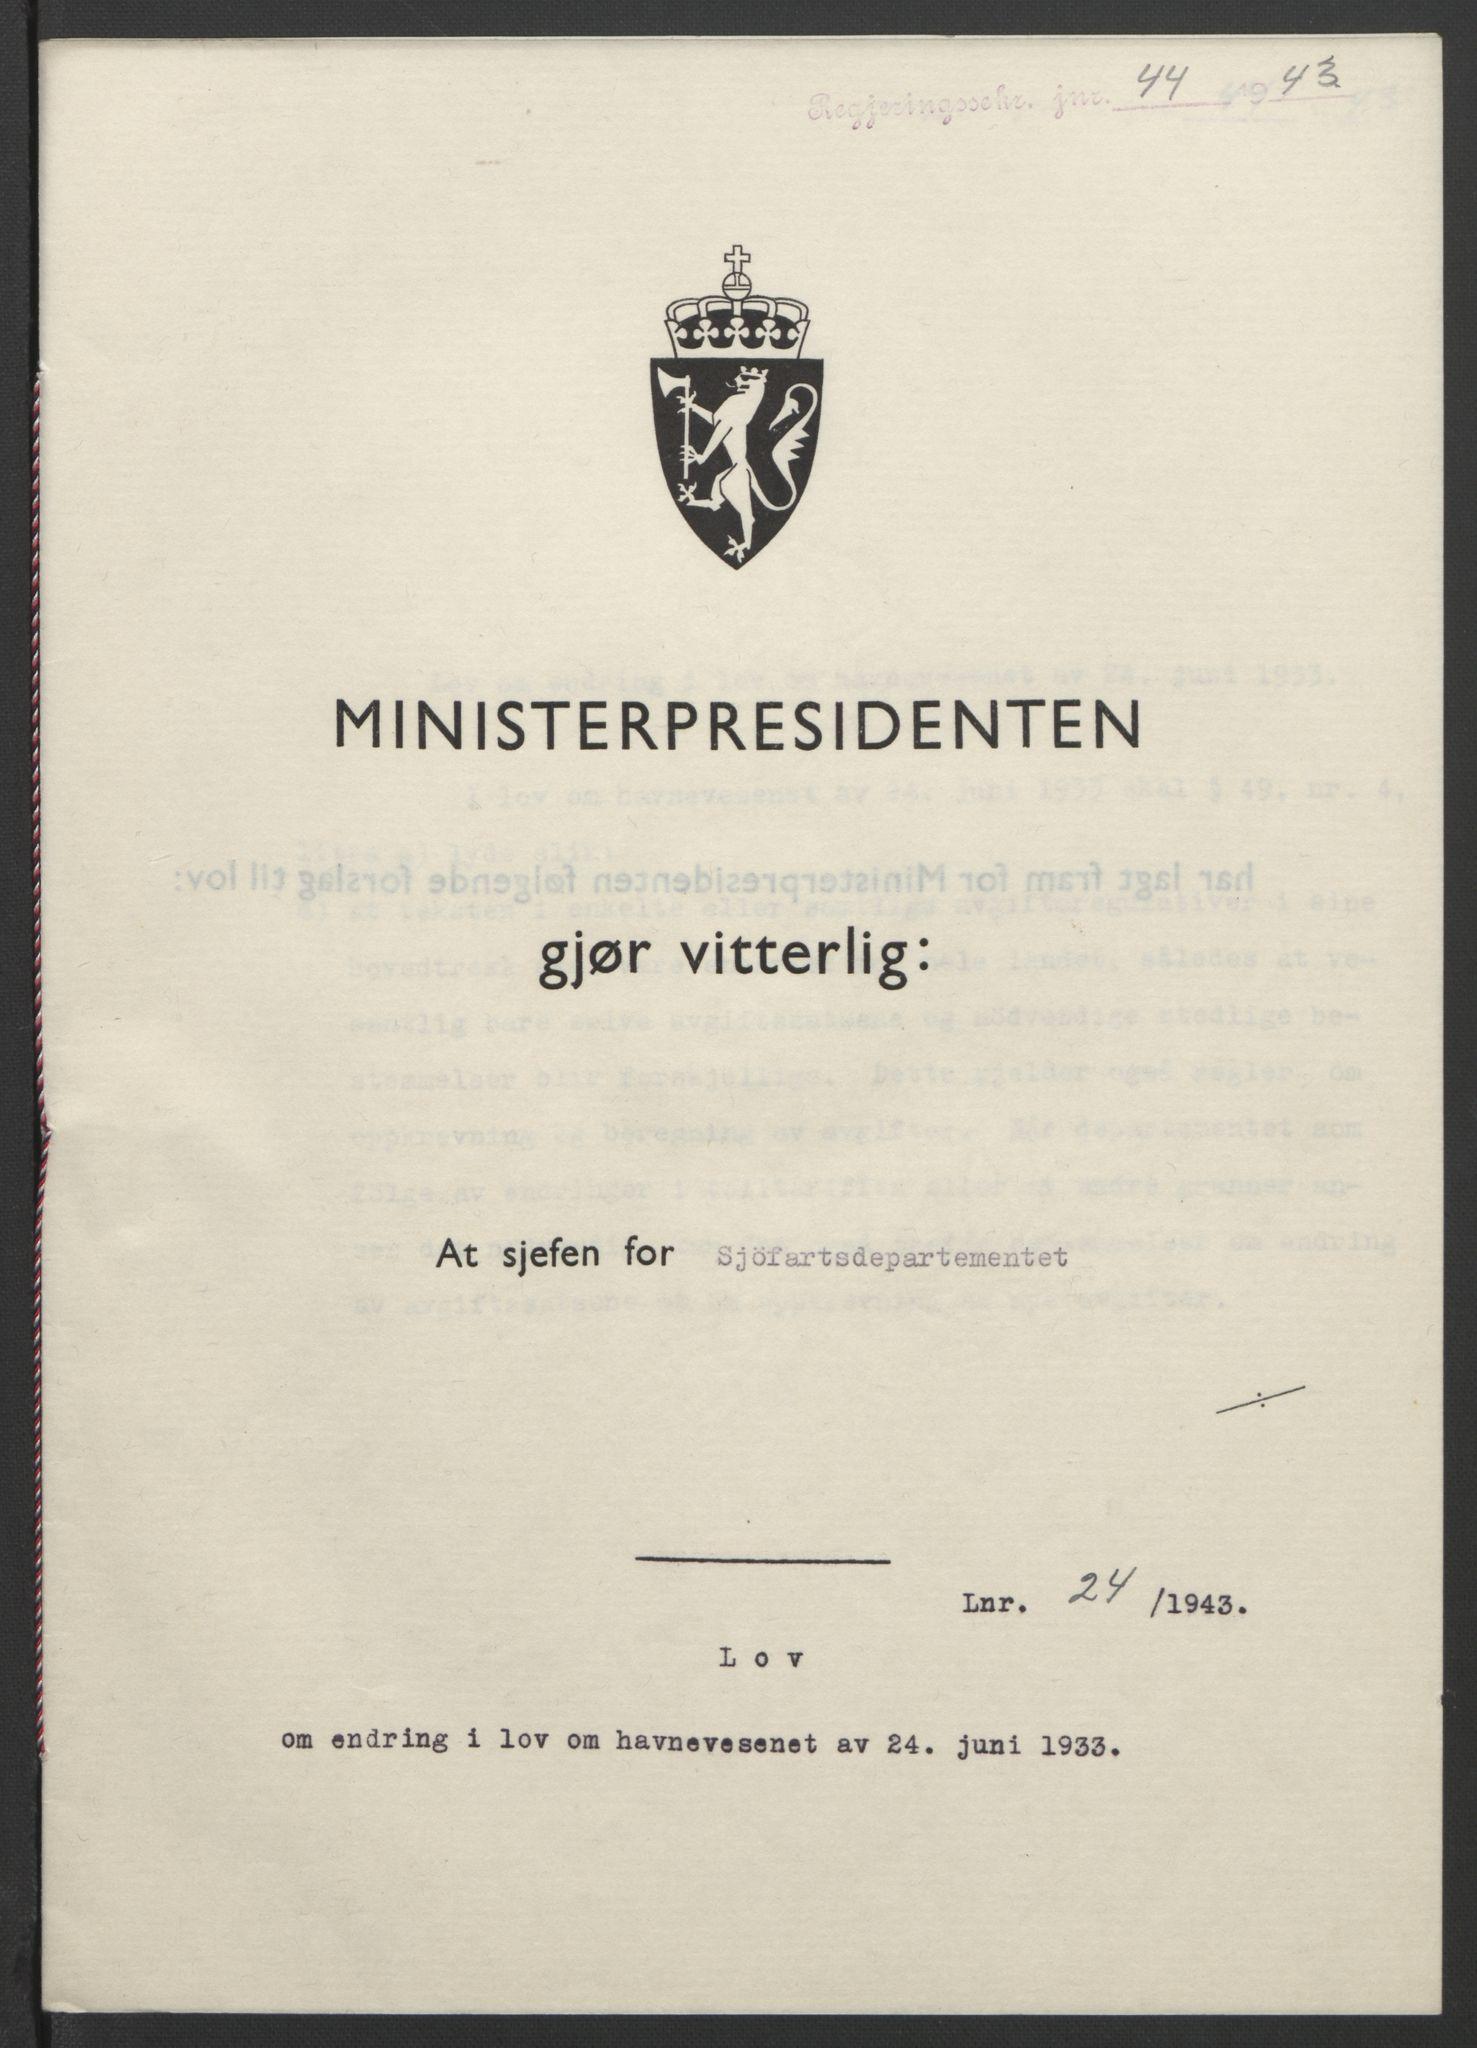 RA, NS-administrasjonen 1940-1945 (Statsrådsekretariatet, de kommisariske statsråder mm), D/Db/L0099: Lover, 1943, s. 97